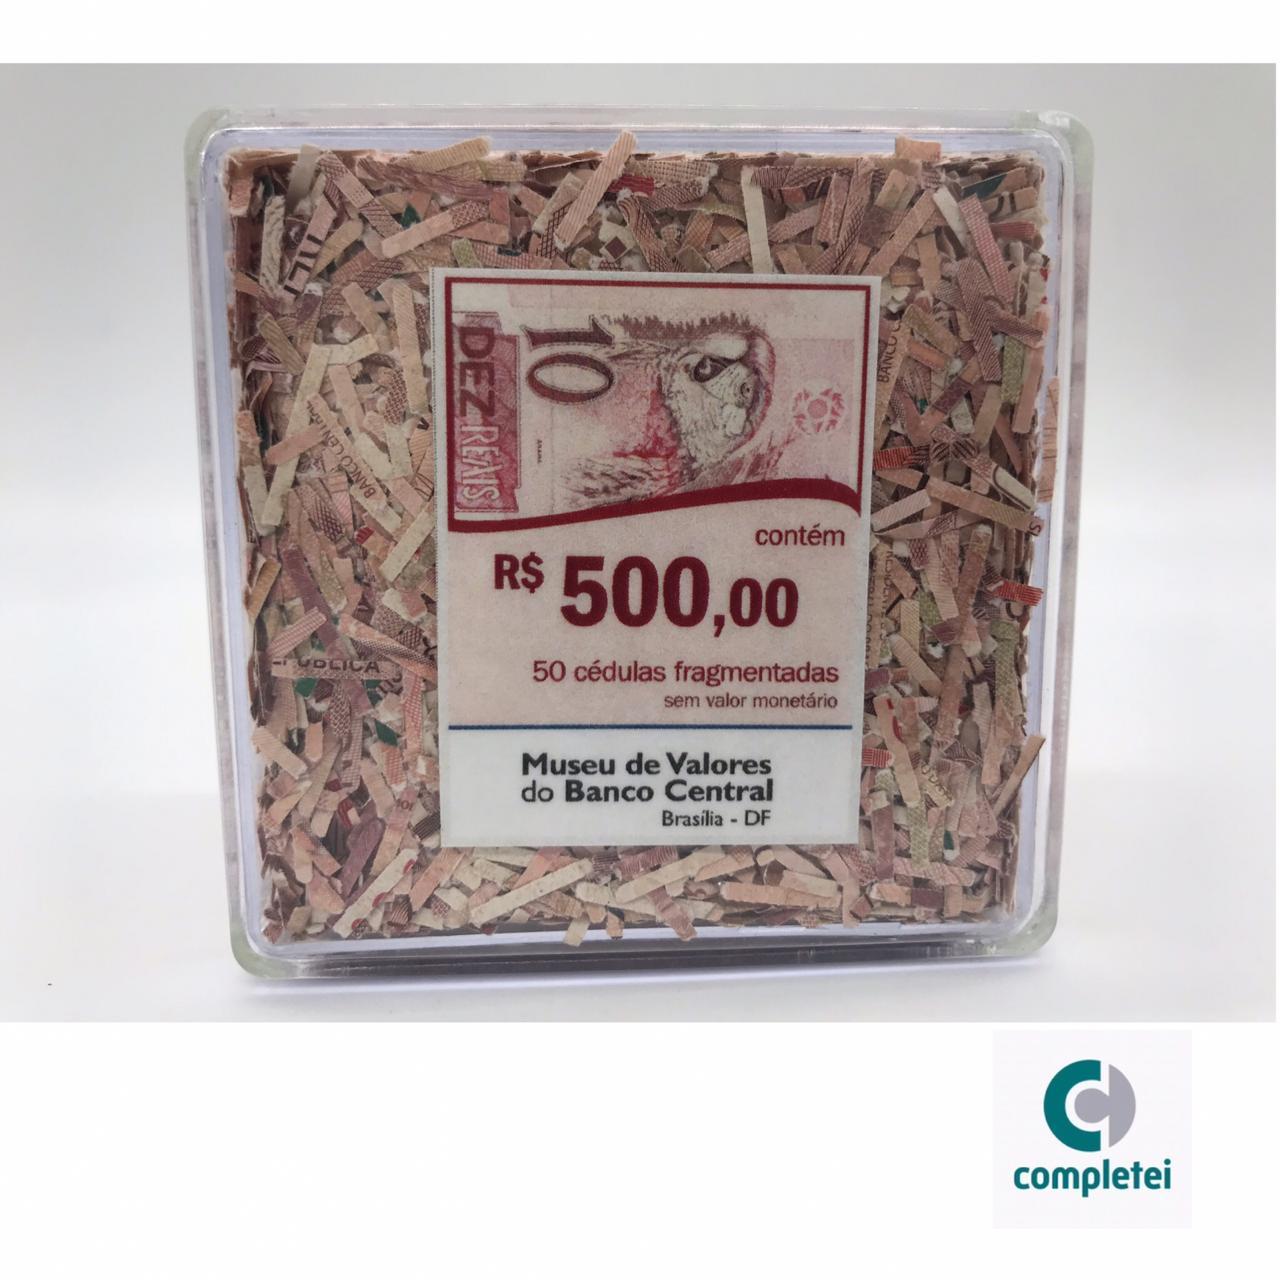 CEDULAS FRAGMENTADAS DE 10,00 ESPECIAL DO MUSEU DE VALORES DO BANCO CENTRAL